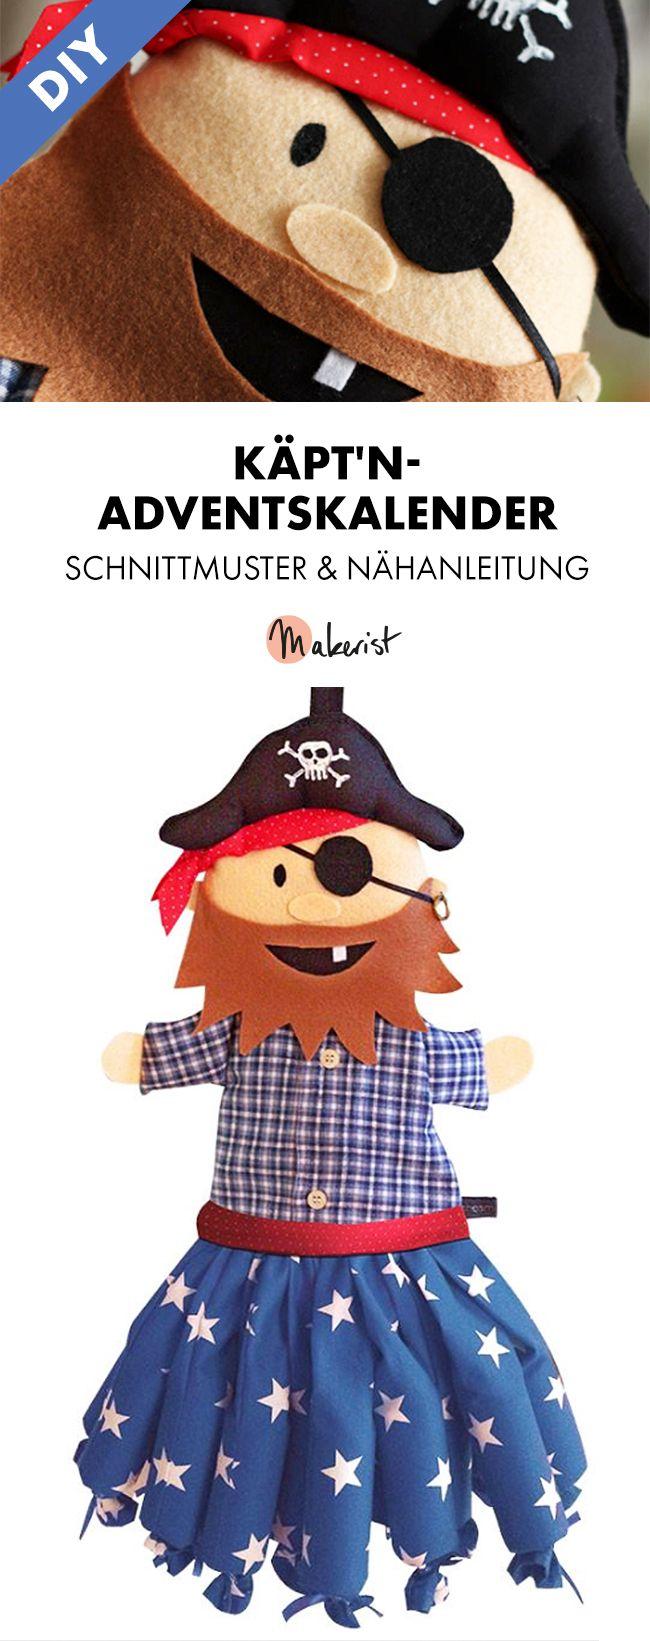 650 best advent calendar images on Pinterest   Adventskalender nähen ...